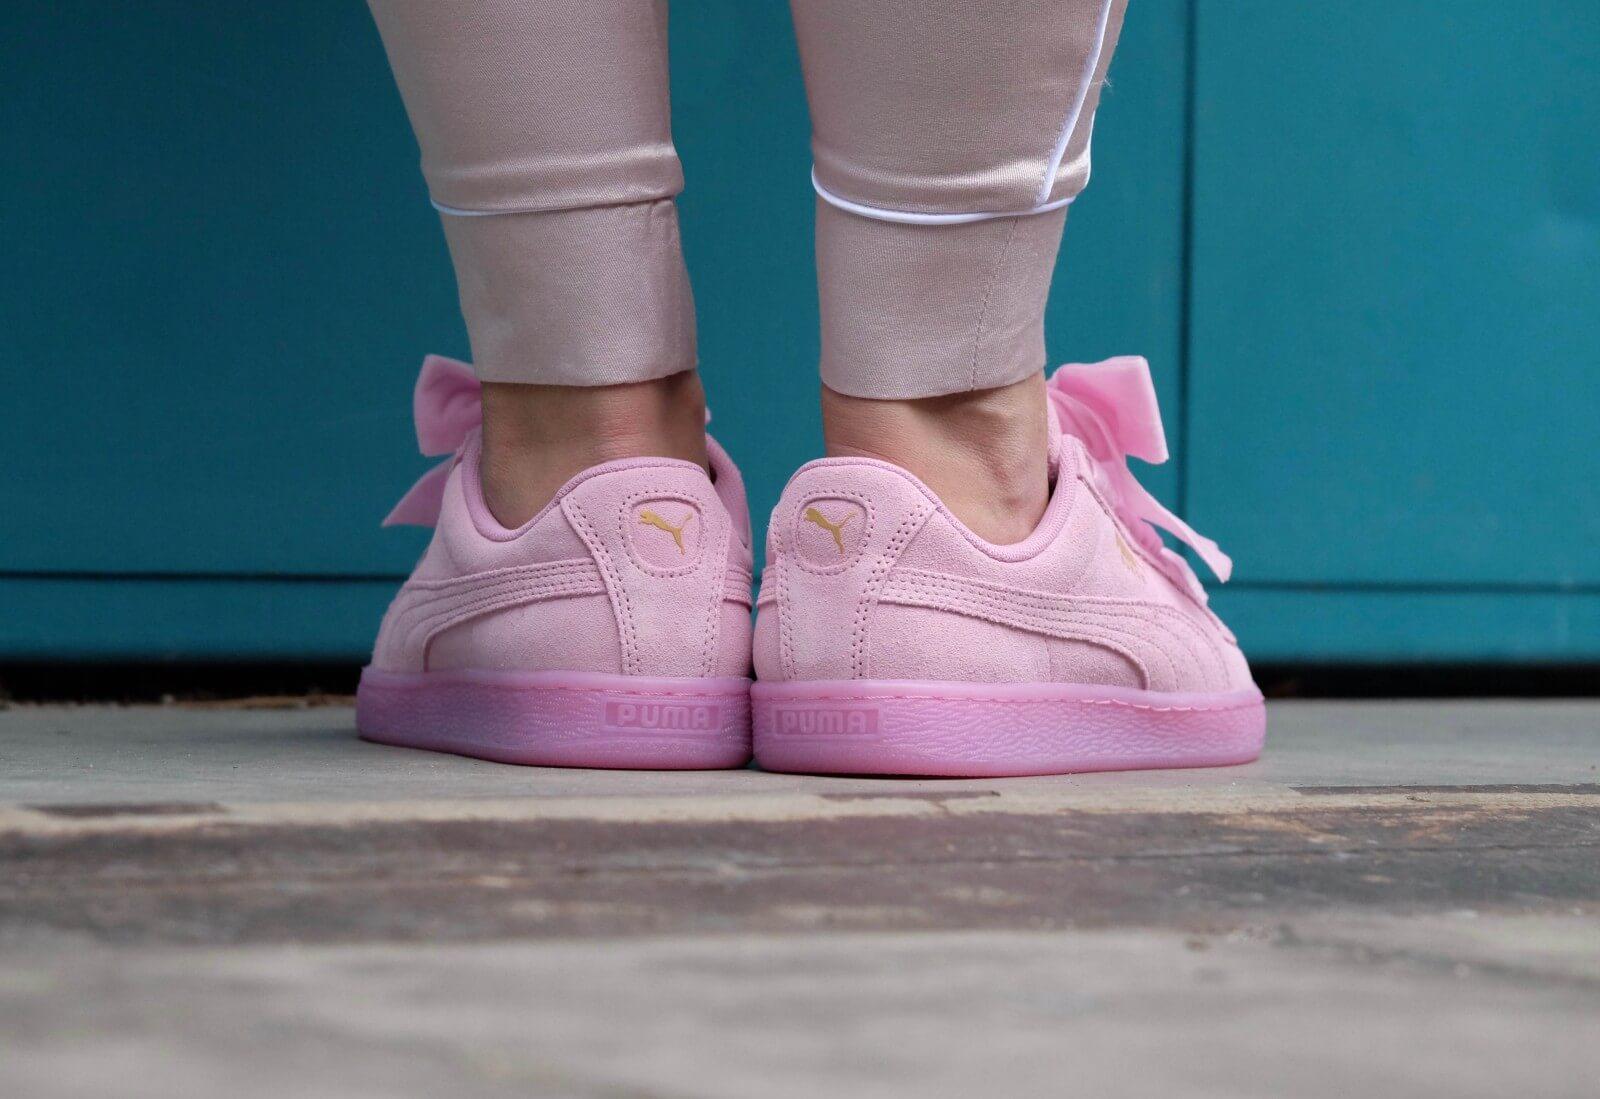 on sale 8f8e4 a67e7 Puma Suede Heart RESET Wn's — Prism Pink (36-40)